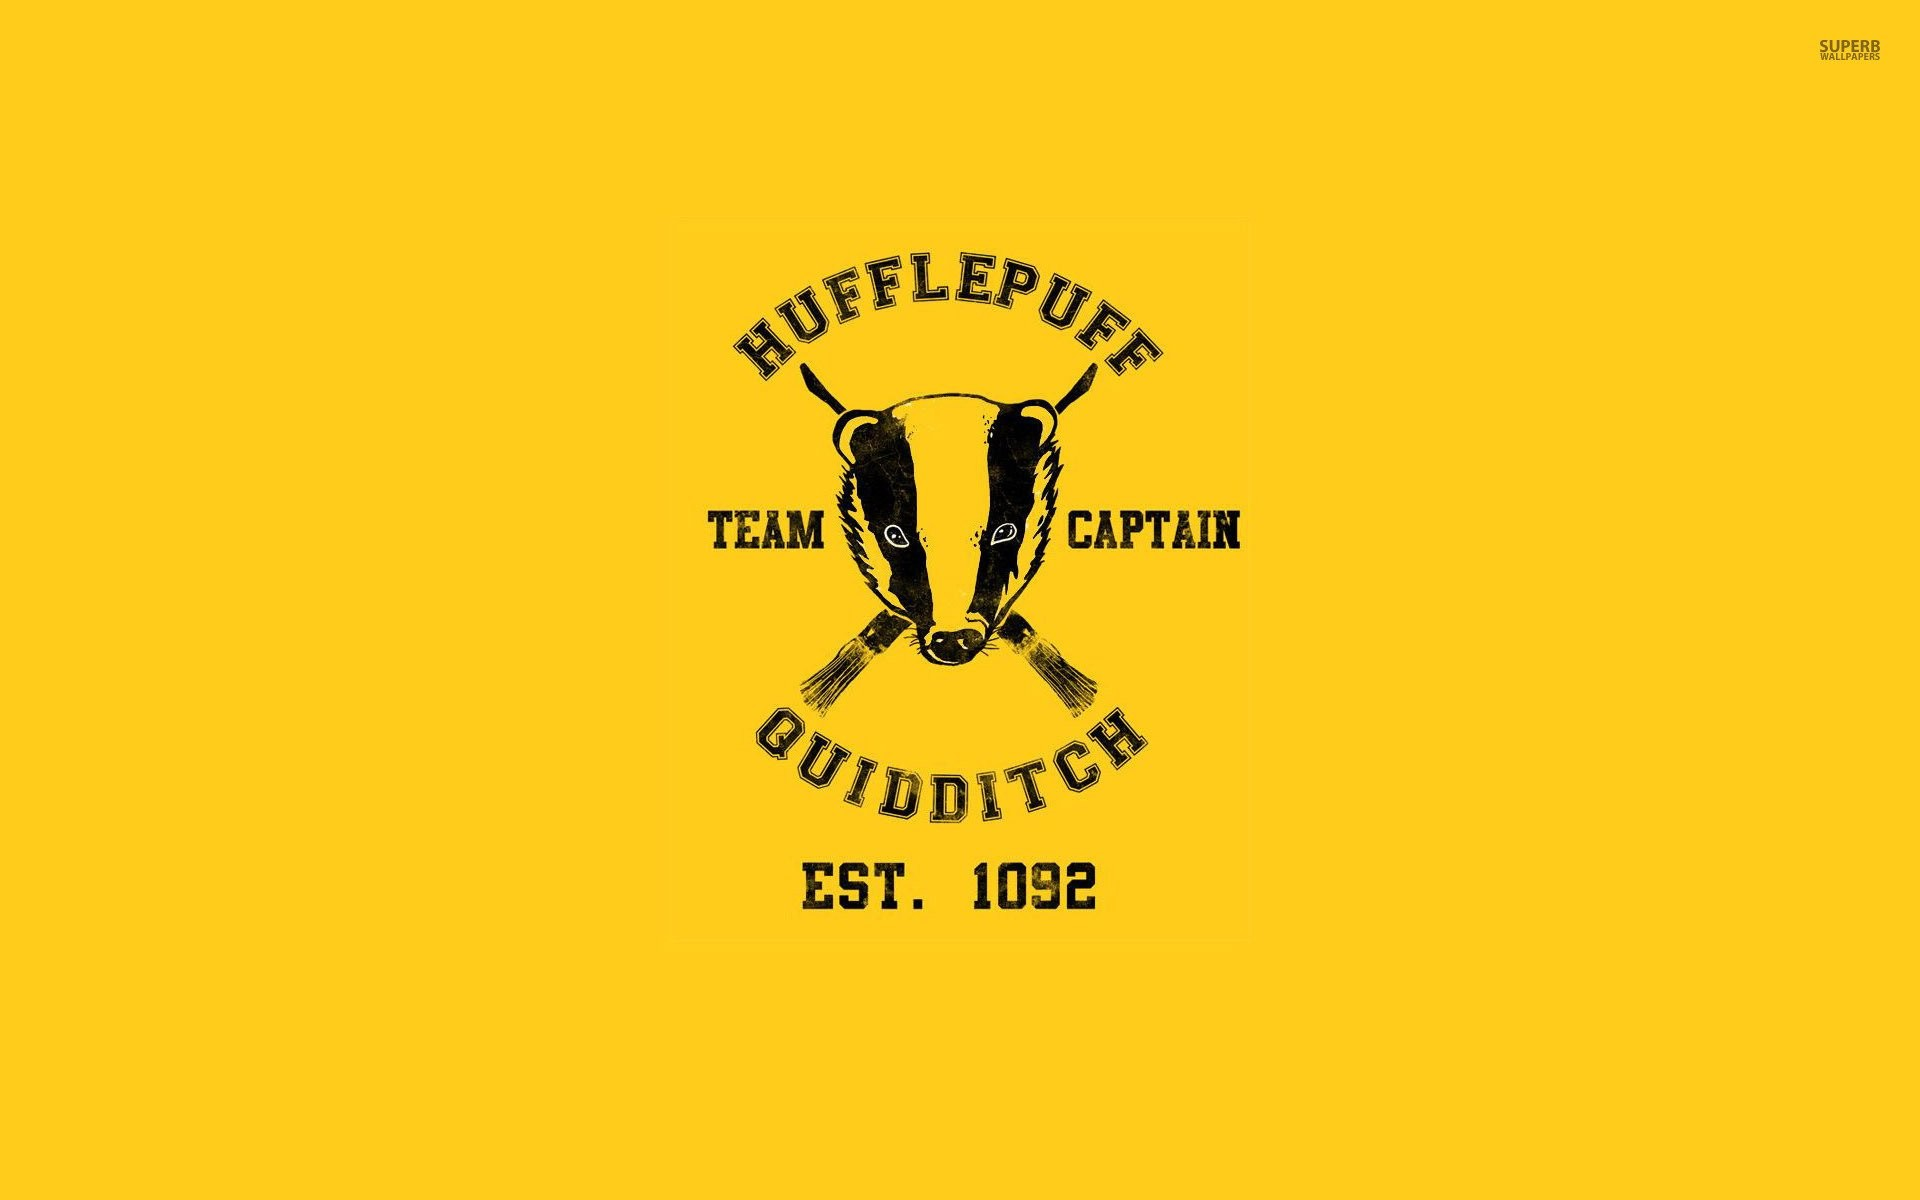 Hufflepuff Quidditch Team – Harry Potter